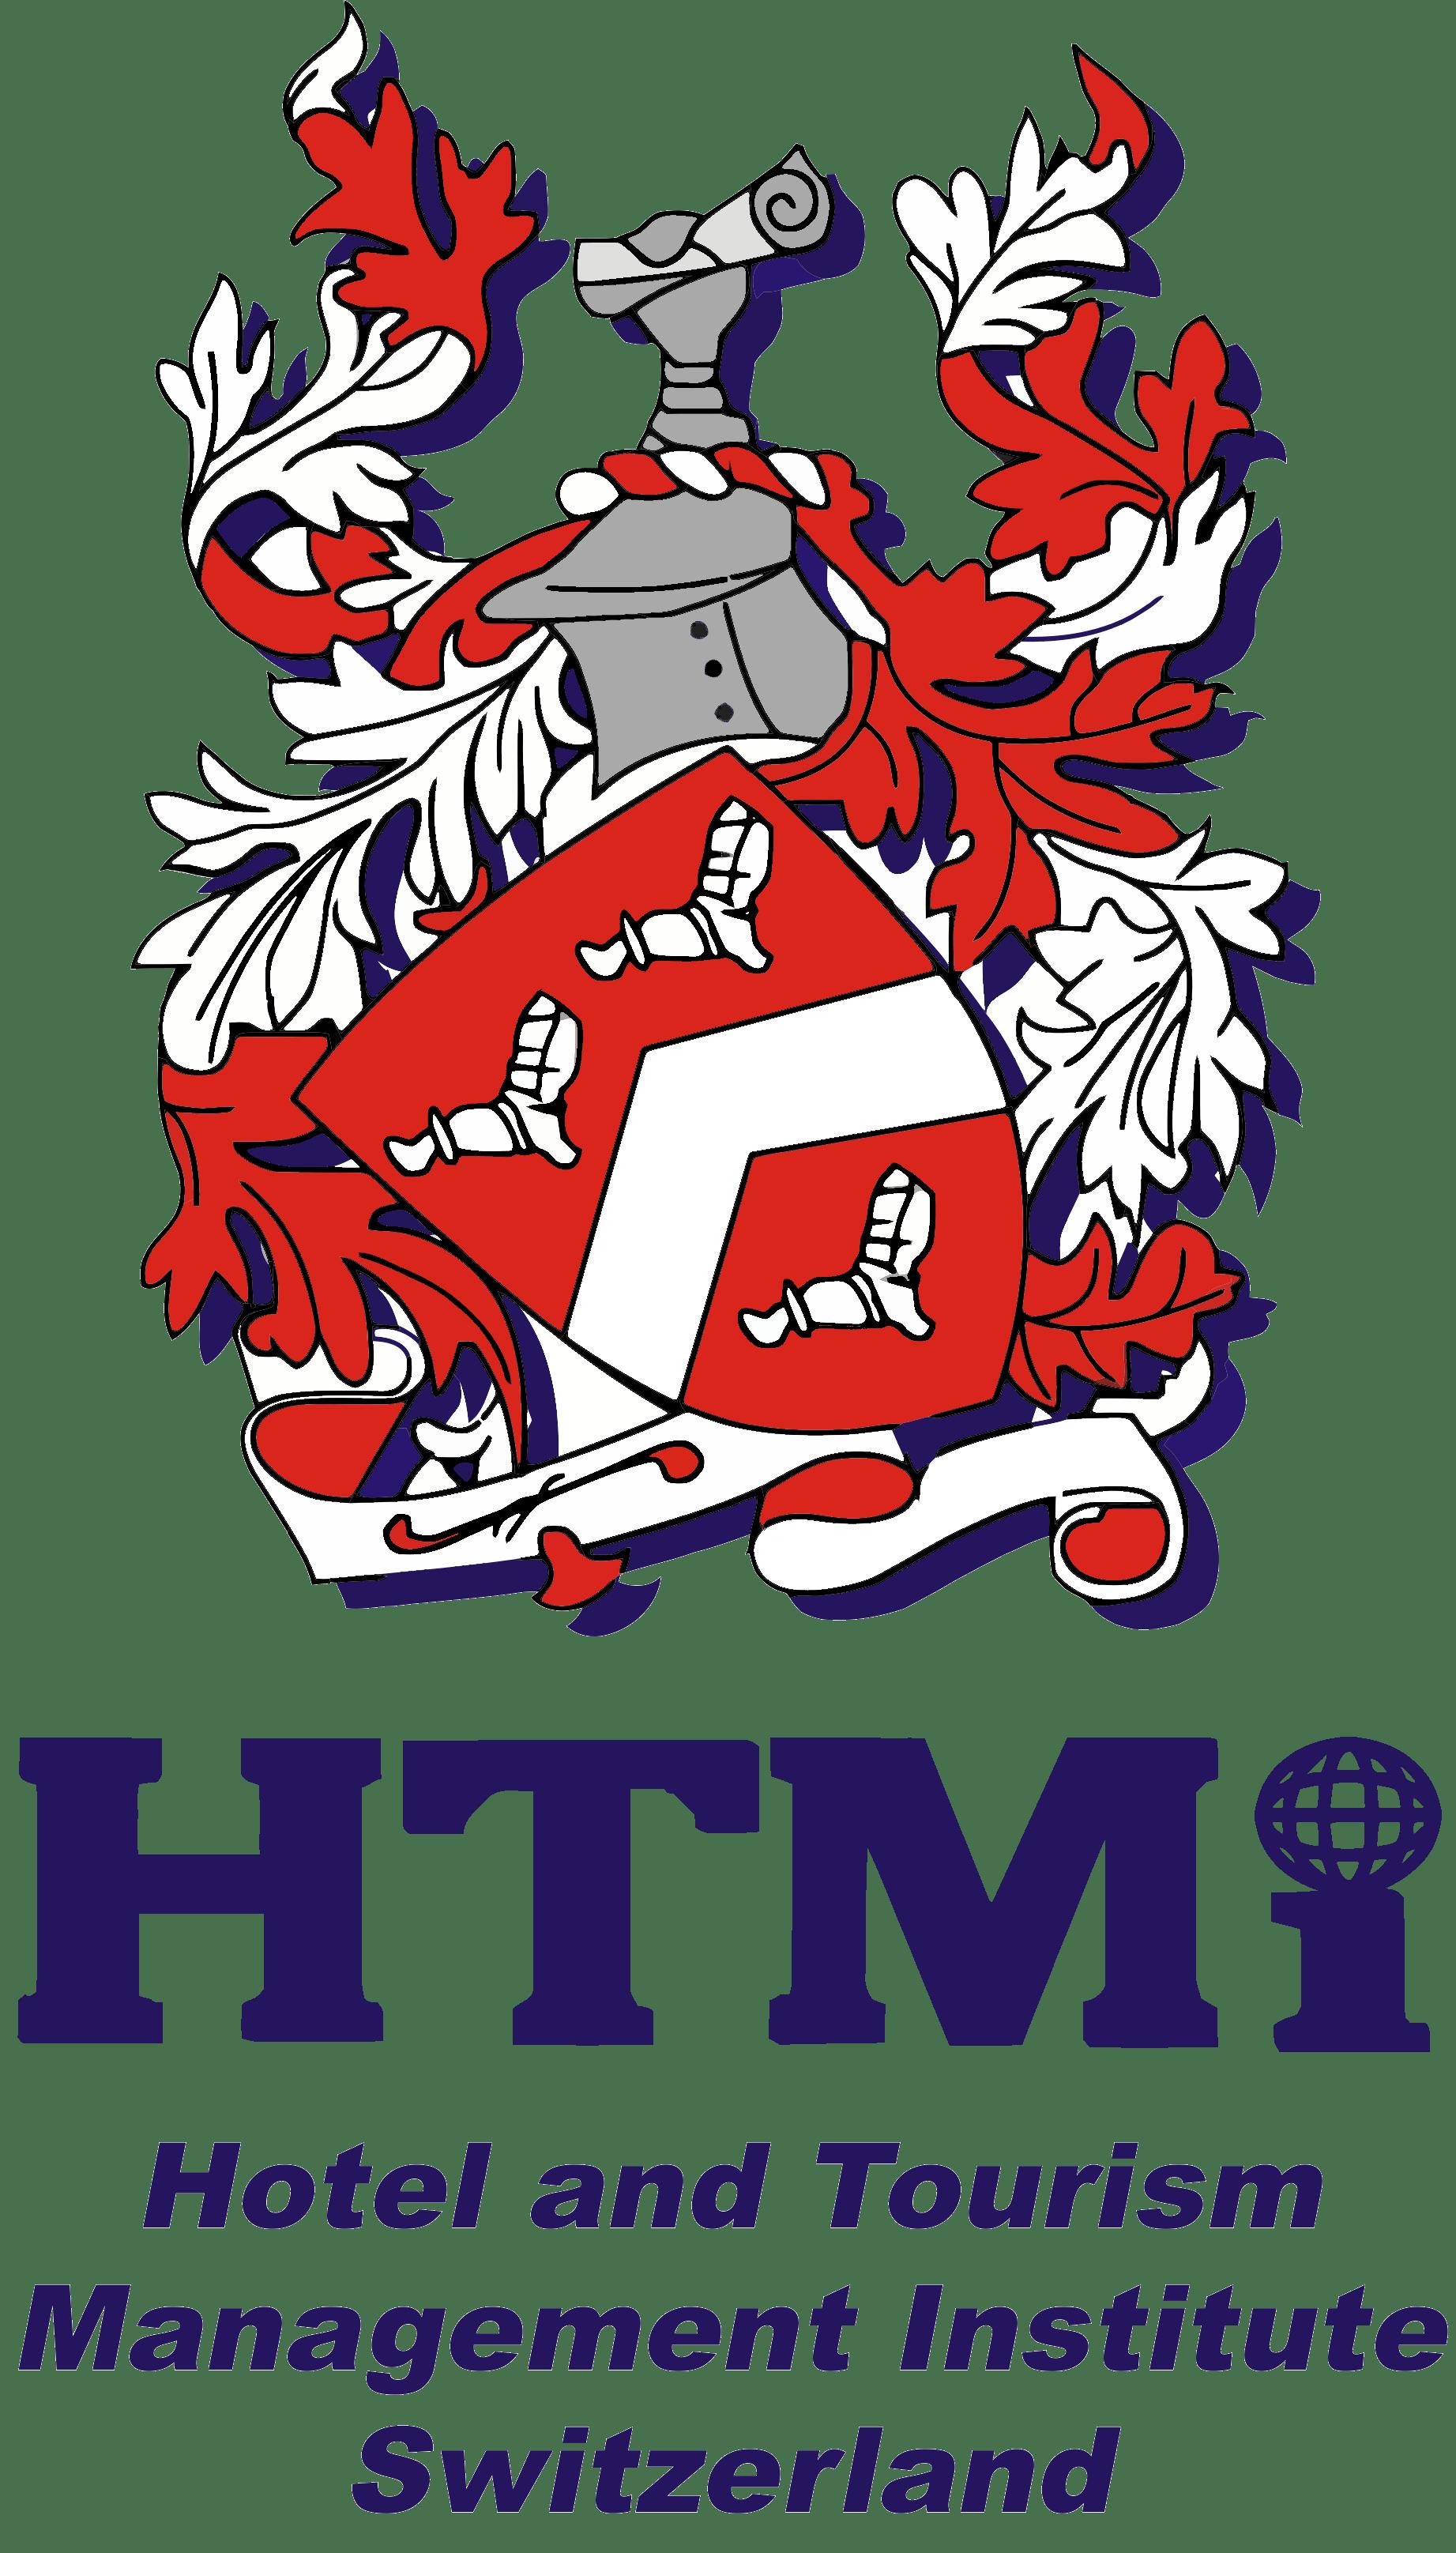 HTMi Hotel and Tourism Management Institute